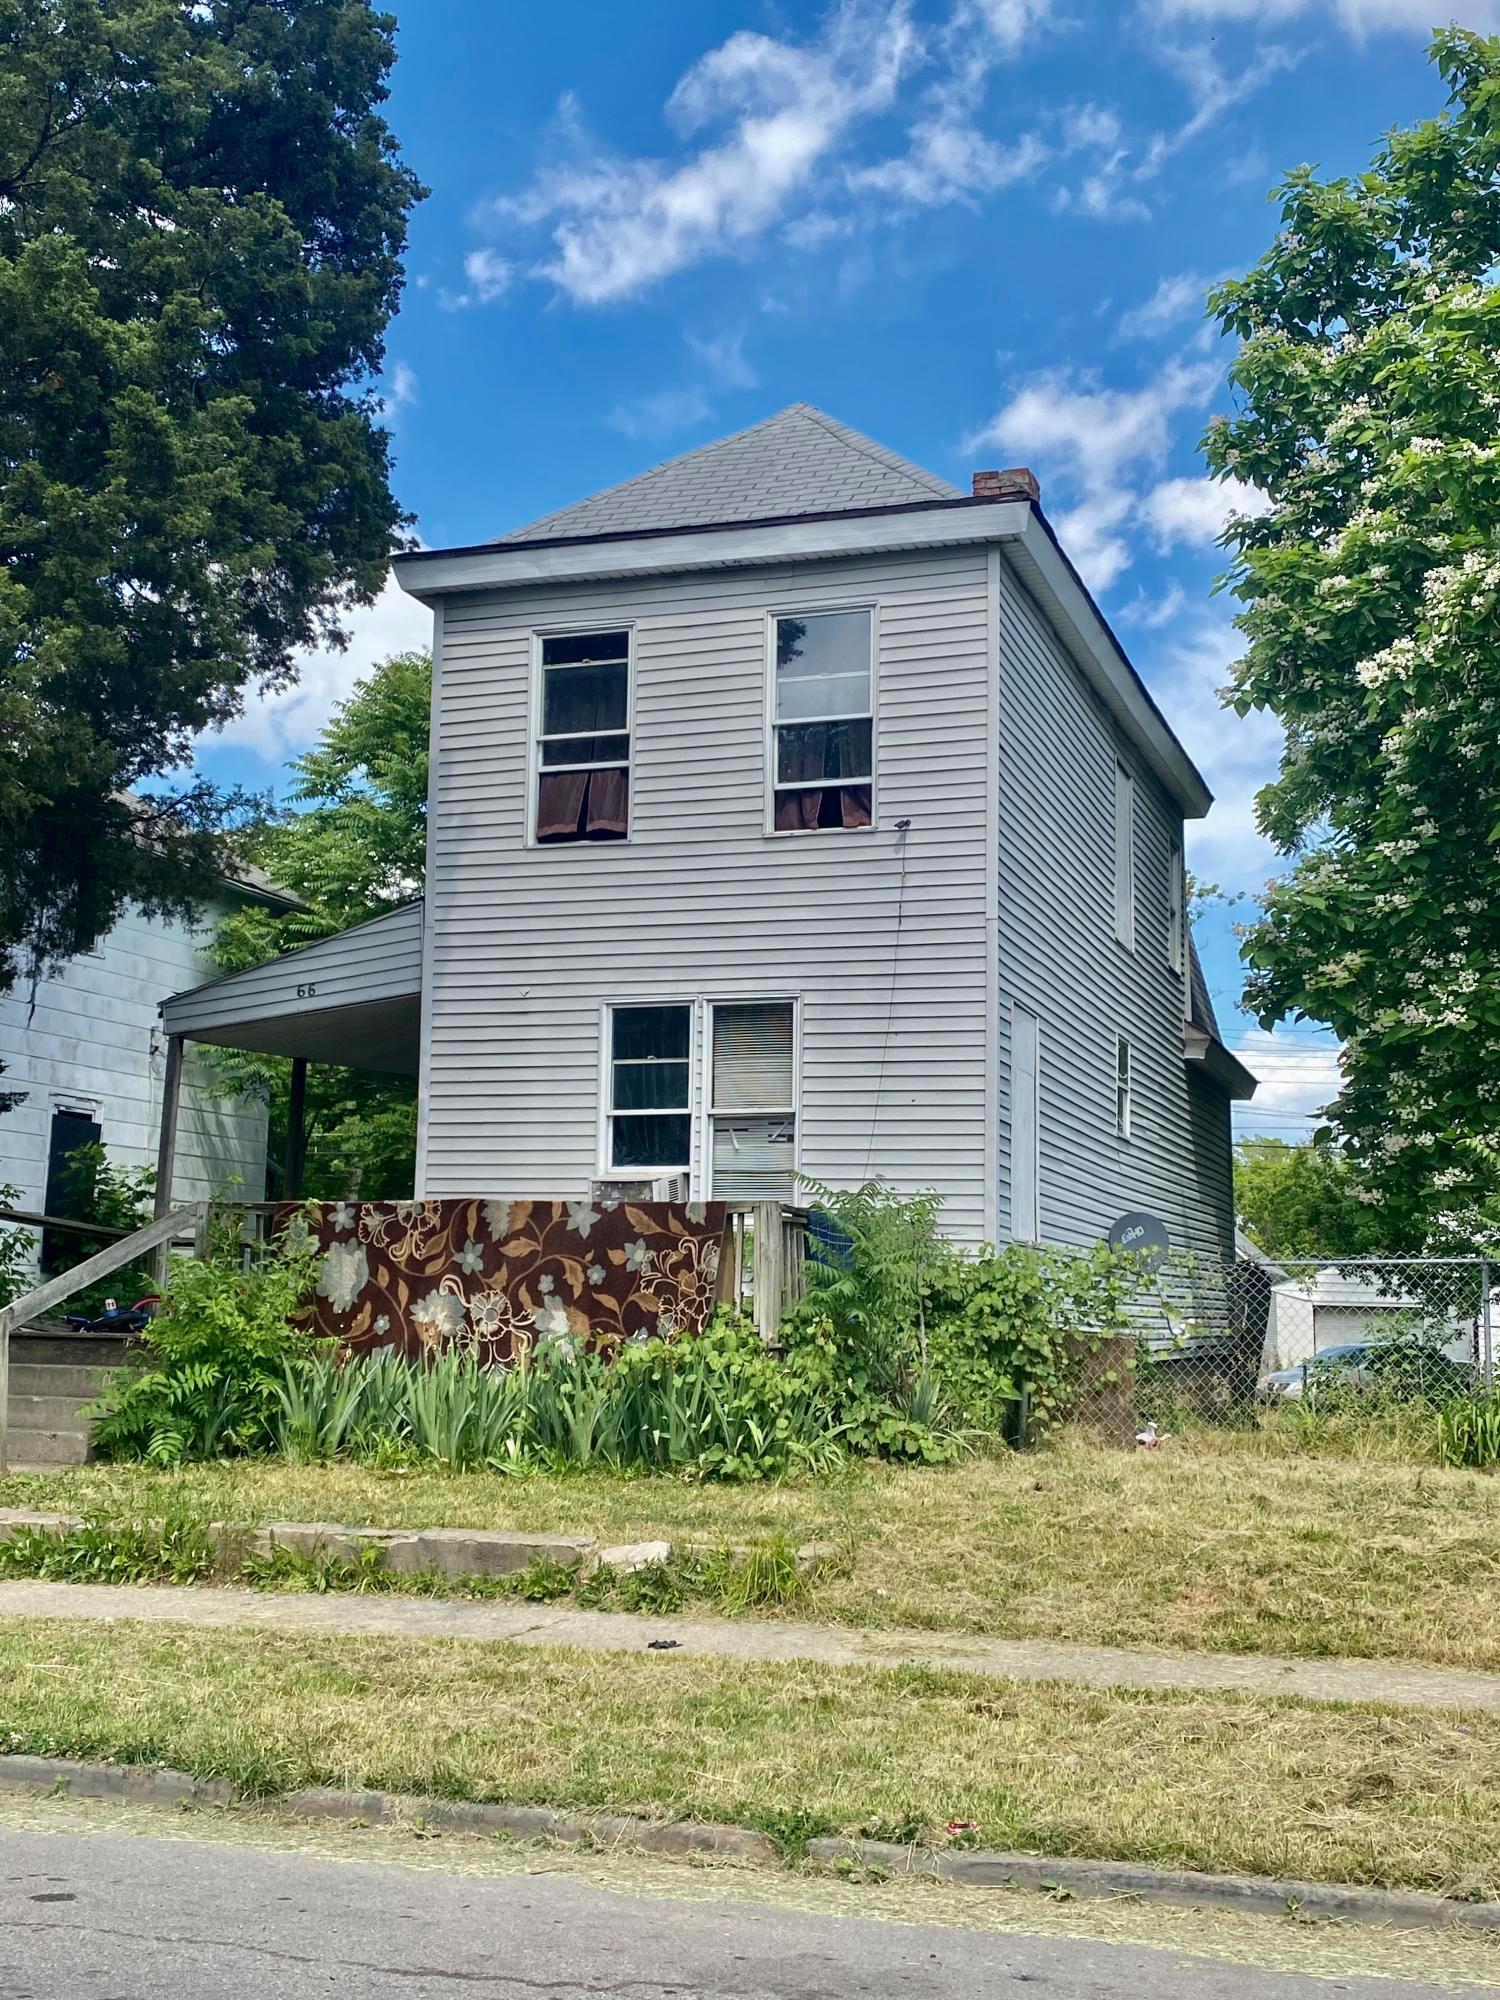 66 Wheatland Avenue, Columbus, Ohio 43204, 3 Bedrooms Bedrooms, ,1 BathroomBathrooms,Residential,For Sale,Wheatland,220019523